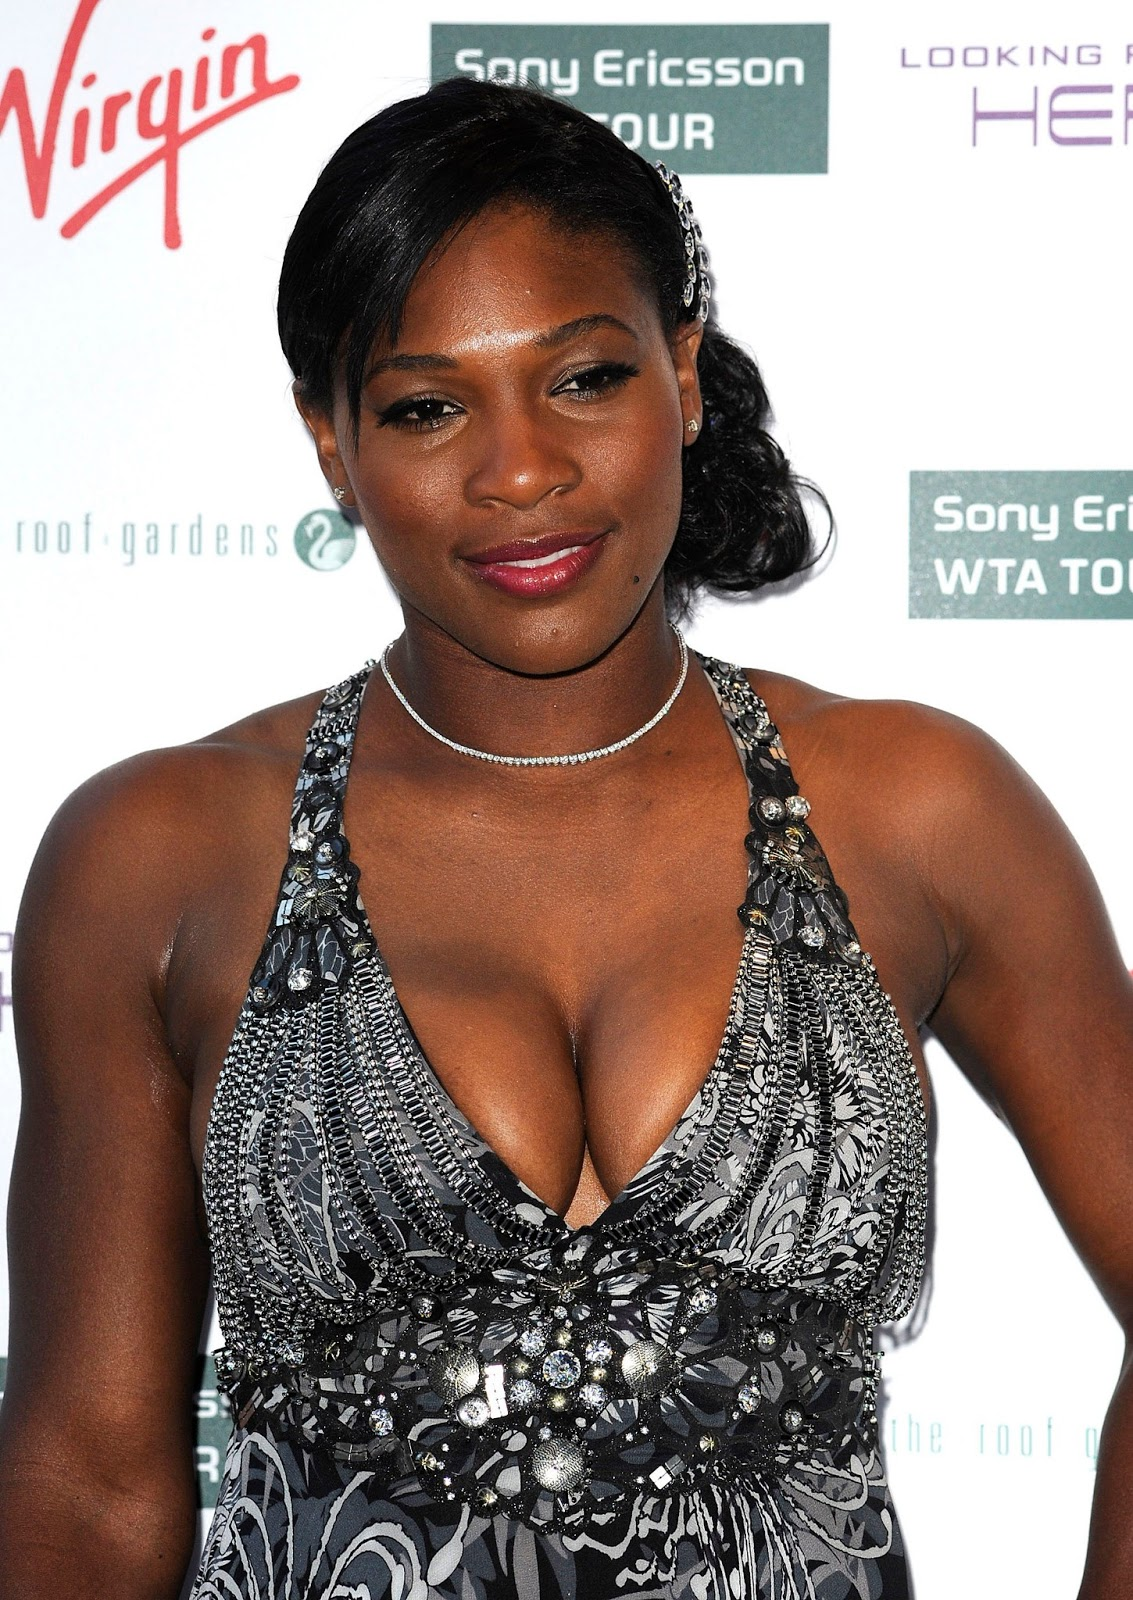 Cleavage Serena Williams nude (61 photo), Topless, Bikini, Selfie, swimsuit 2015